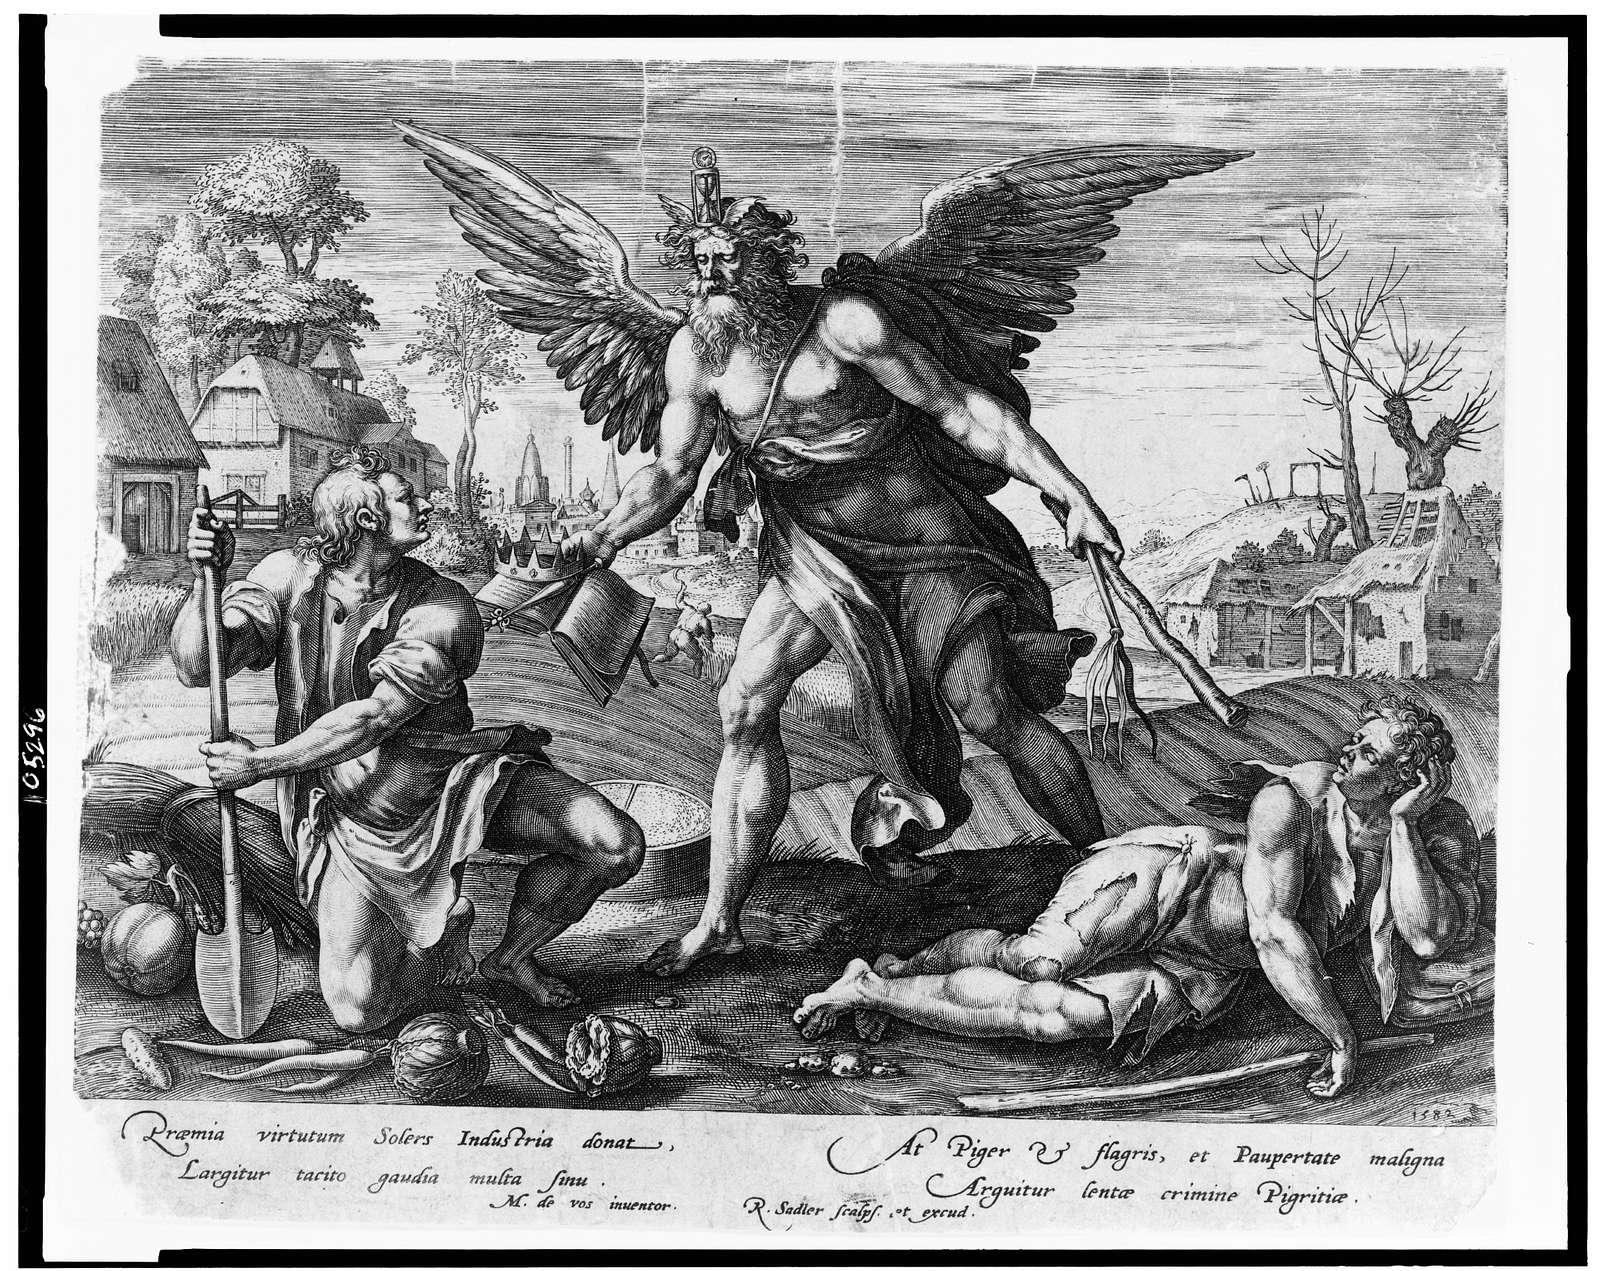 [Allegorical representation of Time rewarding Industry and punishing Indolence] / M. de vos, inventor ; R. Sadler [sic] scalps. et excud.